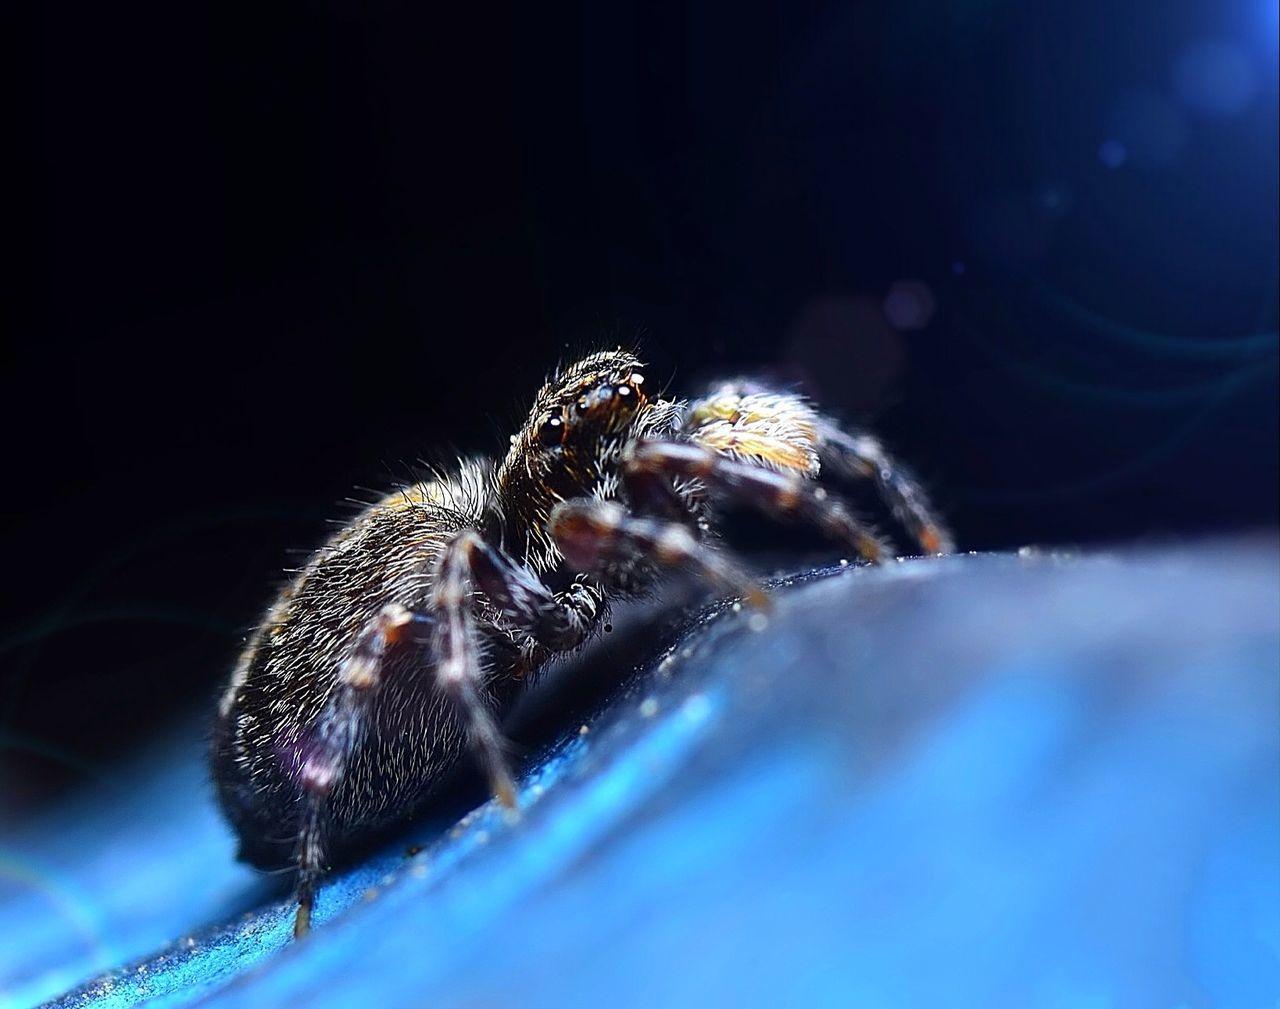 EyeEm Nature Lover Light And Shadow Nature EyeEm Best Shots Spider Macro Macro_collection Macro Photography